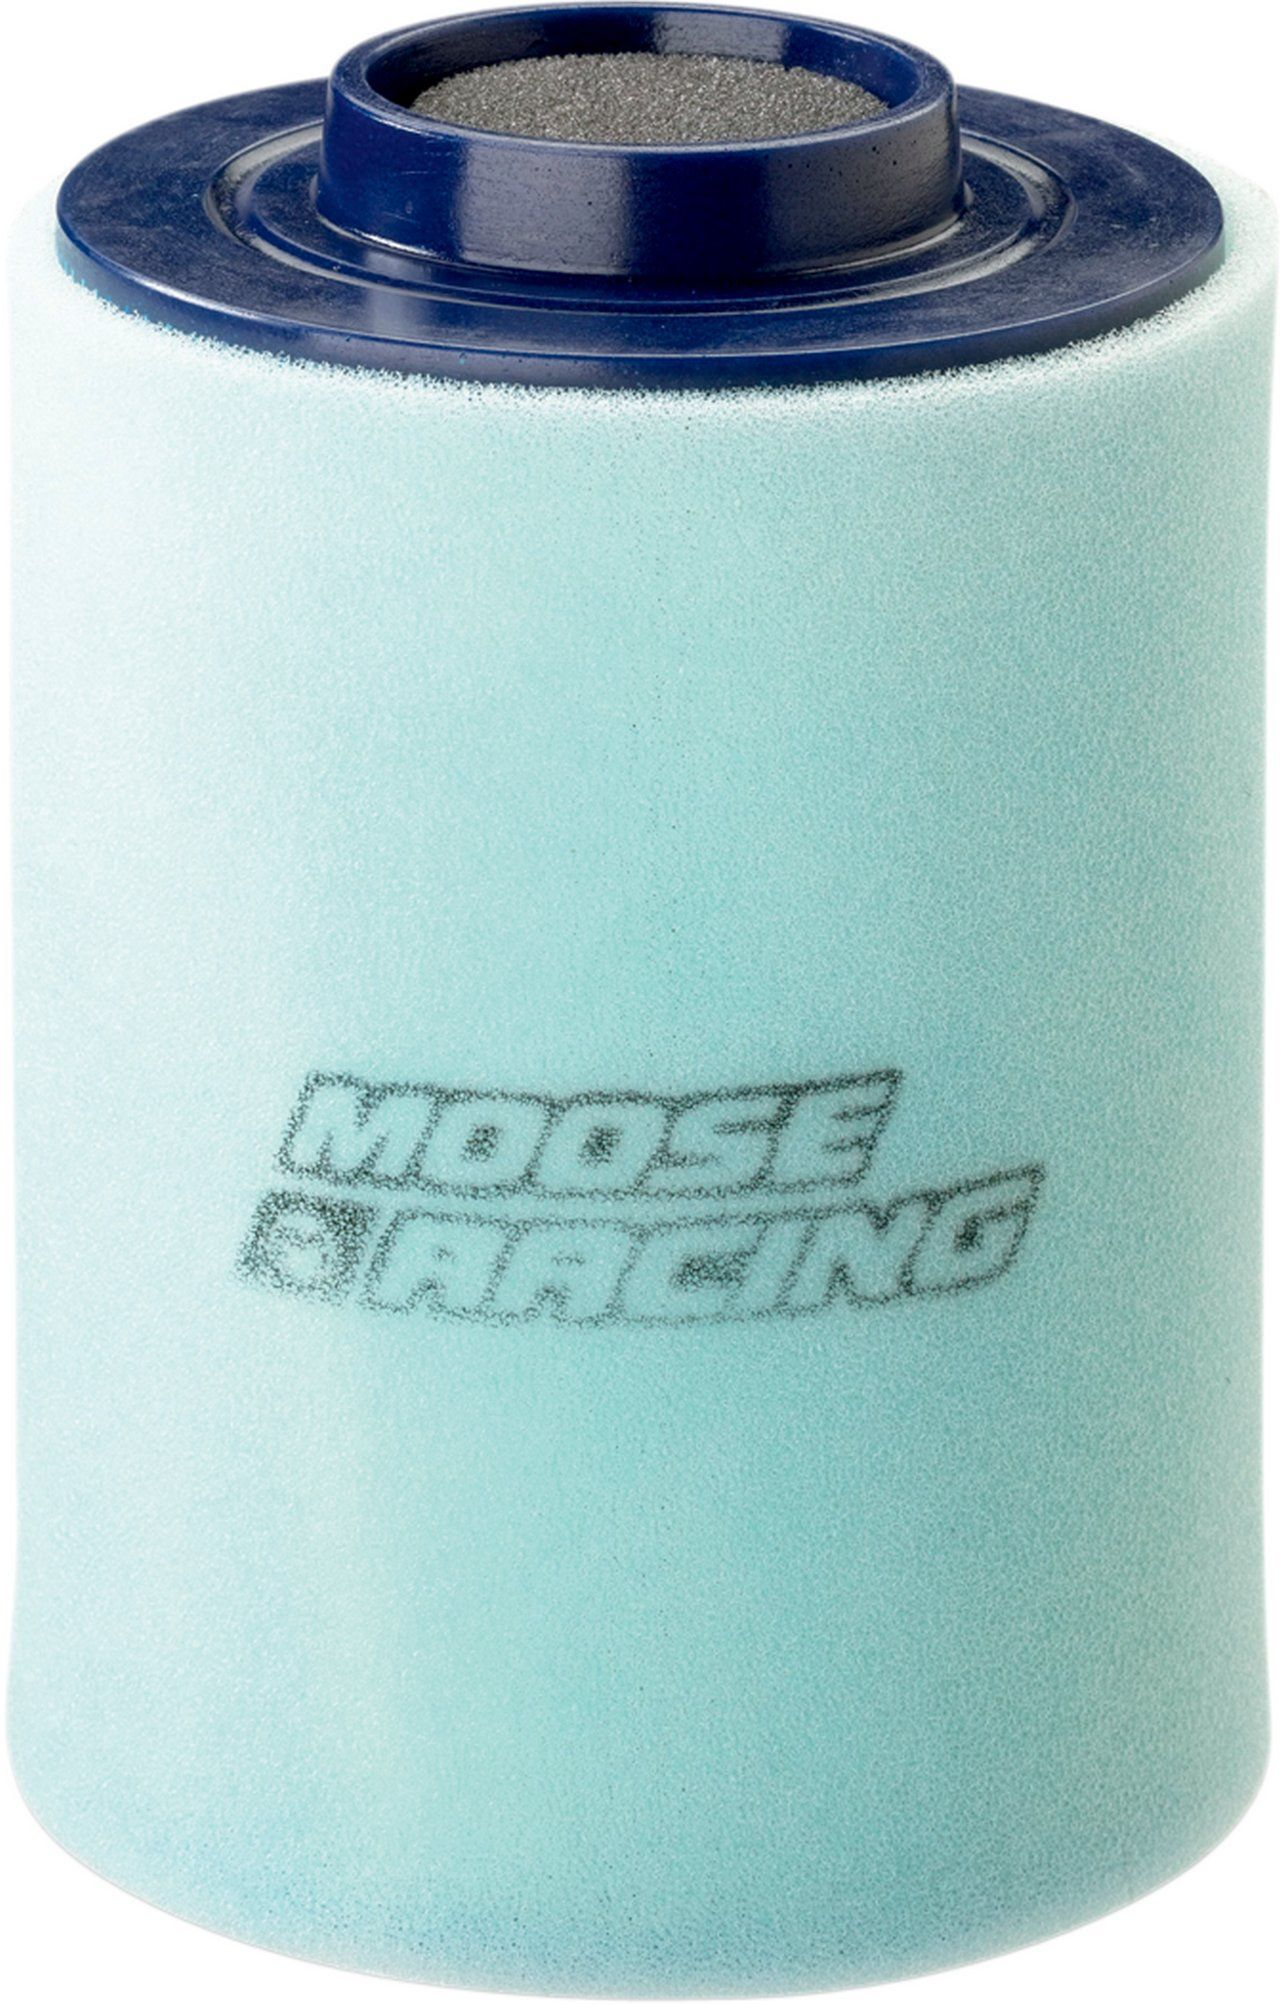 【MOOSE RACING】PPO (PRECISION PRE-OILED) 空氣濾芯 [1011-1994] - 「Webike-摩托百貨」